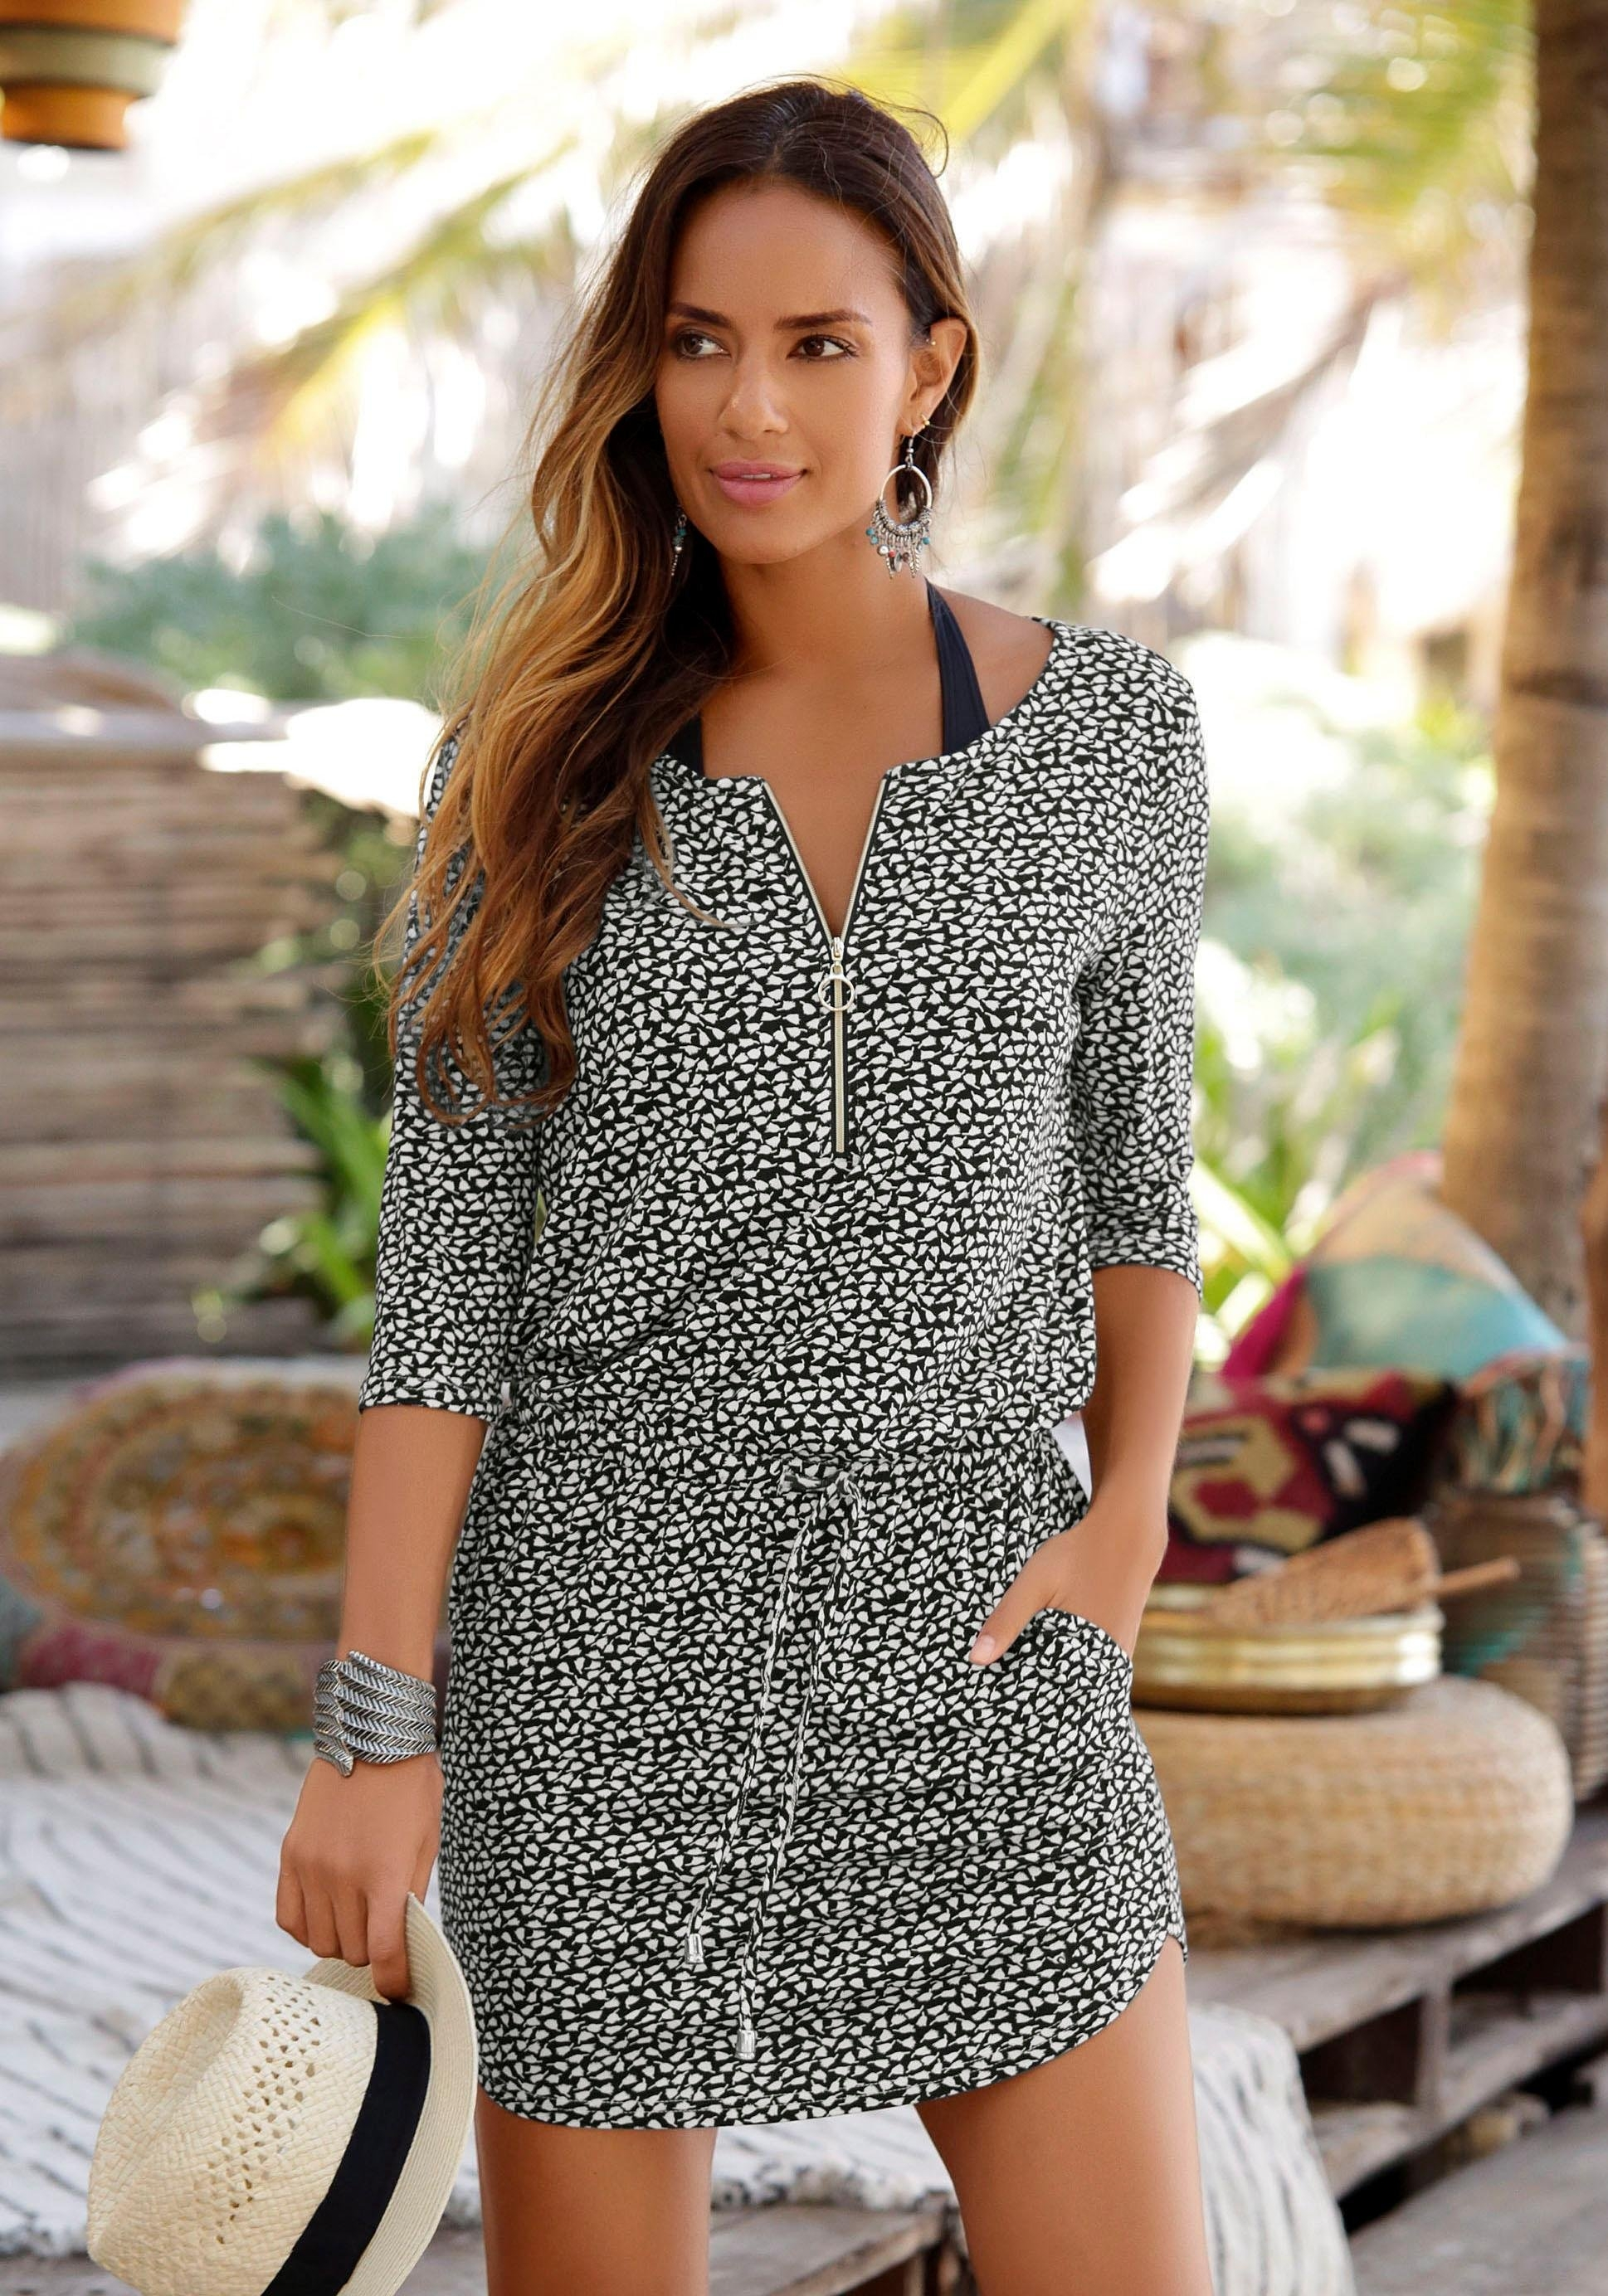 s.Oliver RED LABEL Beachwear s.Oliver Beachwear zomerjurk goedkoop op lascana.nl kopen